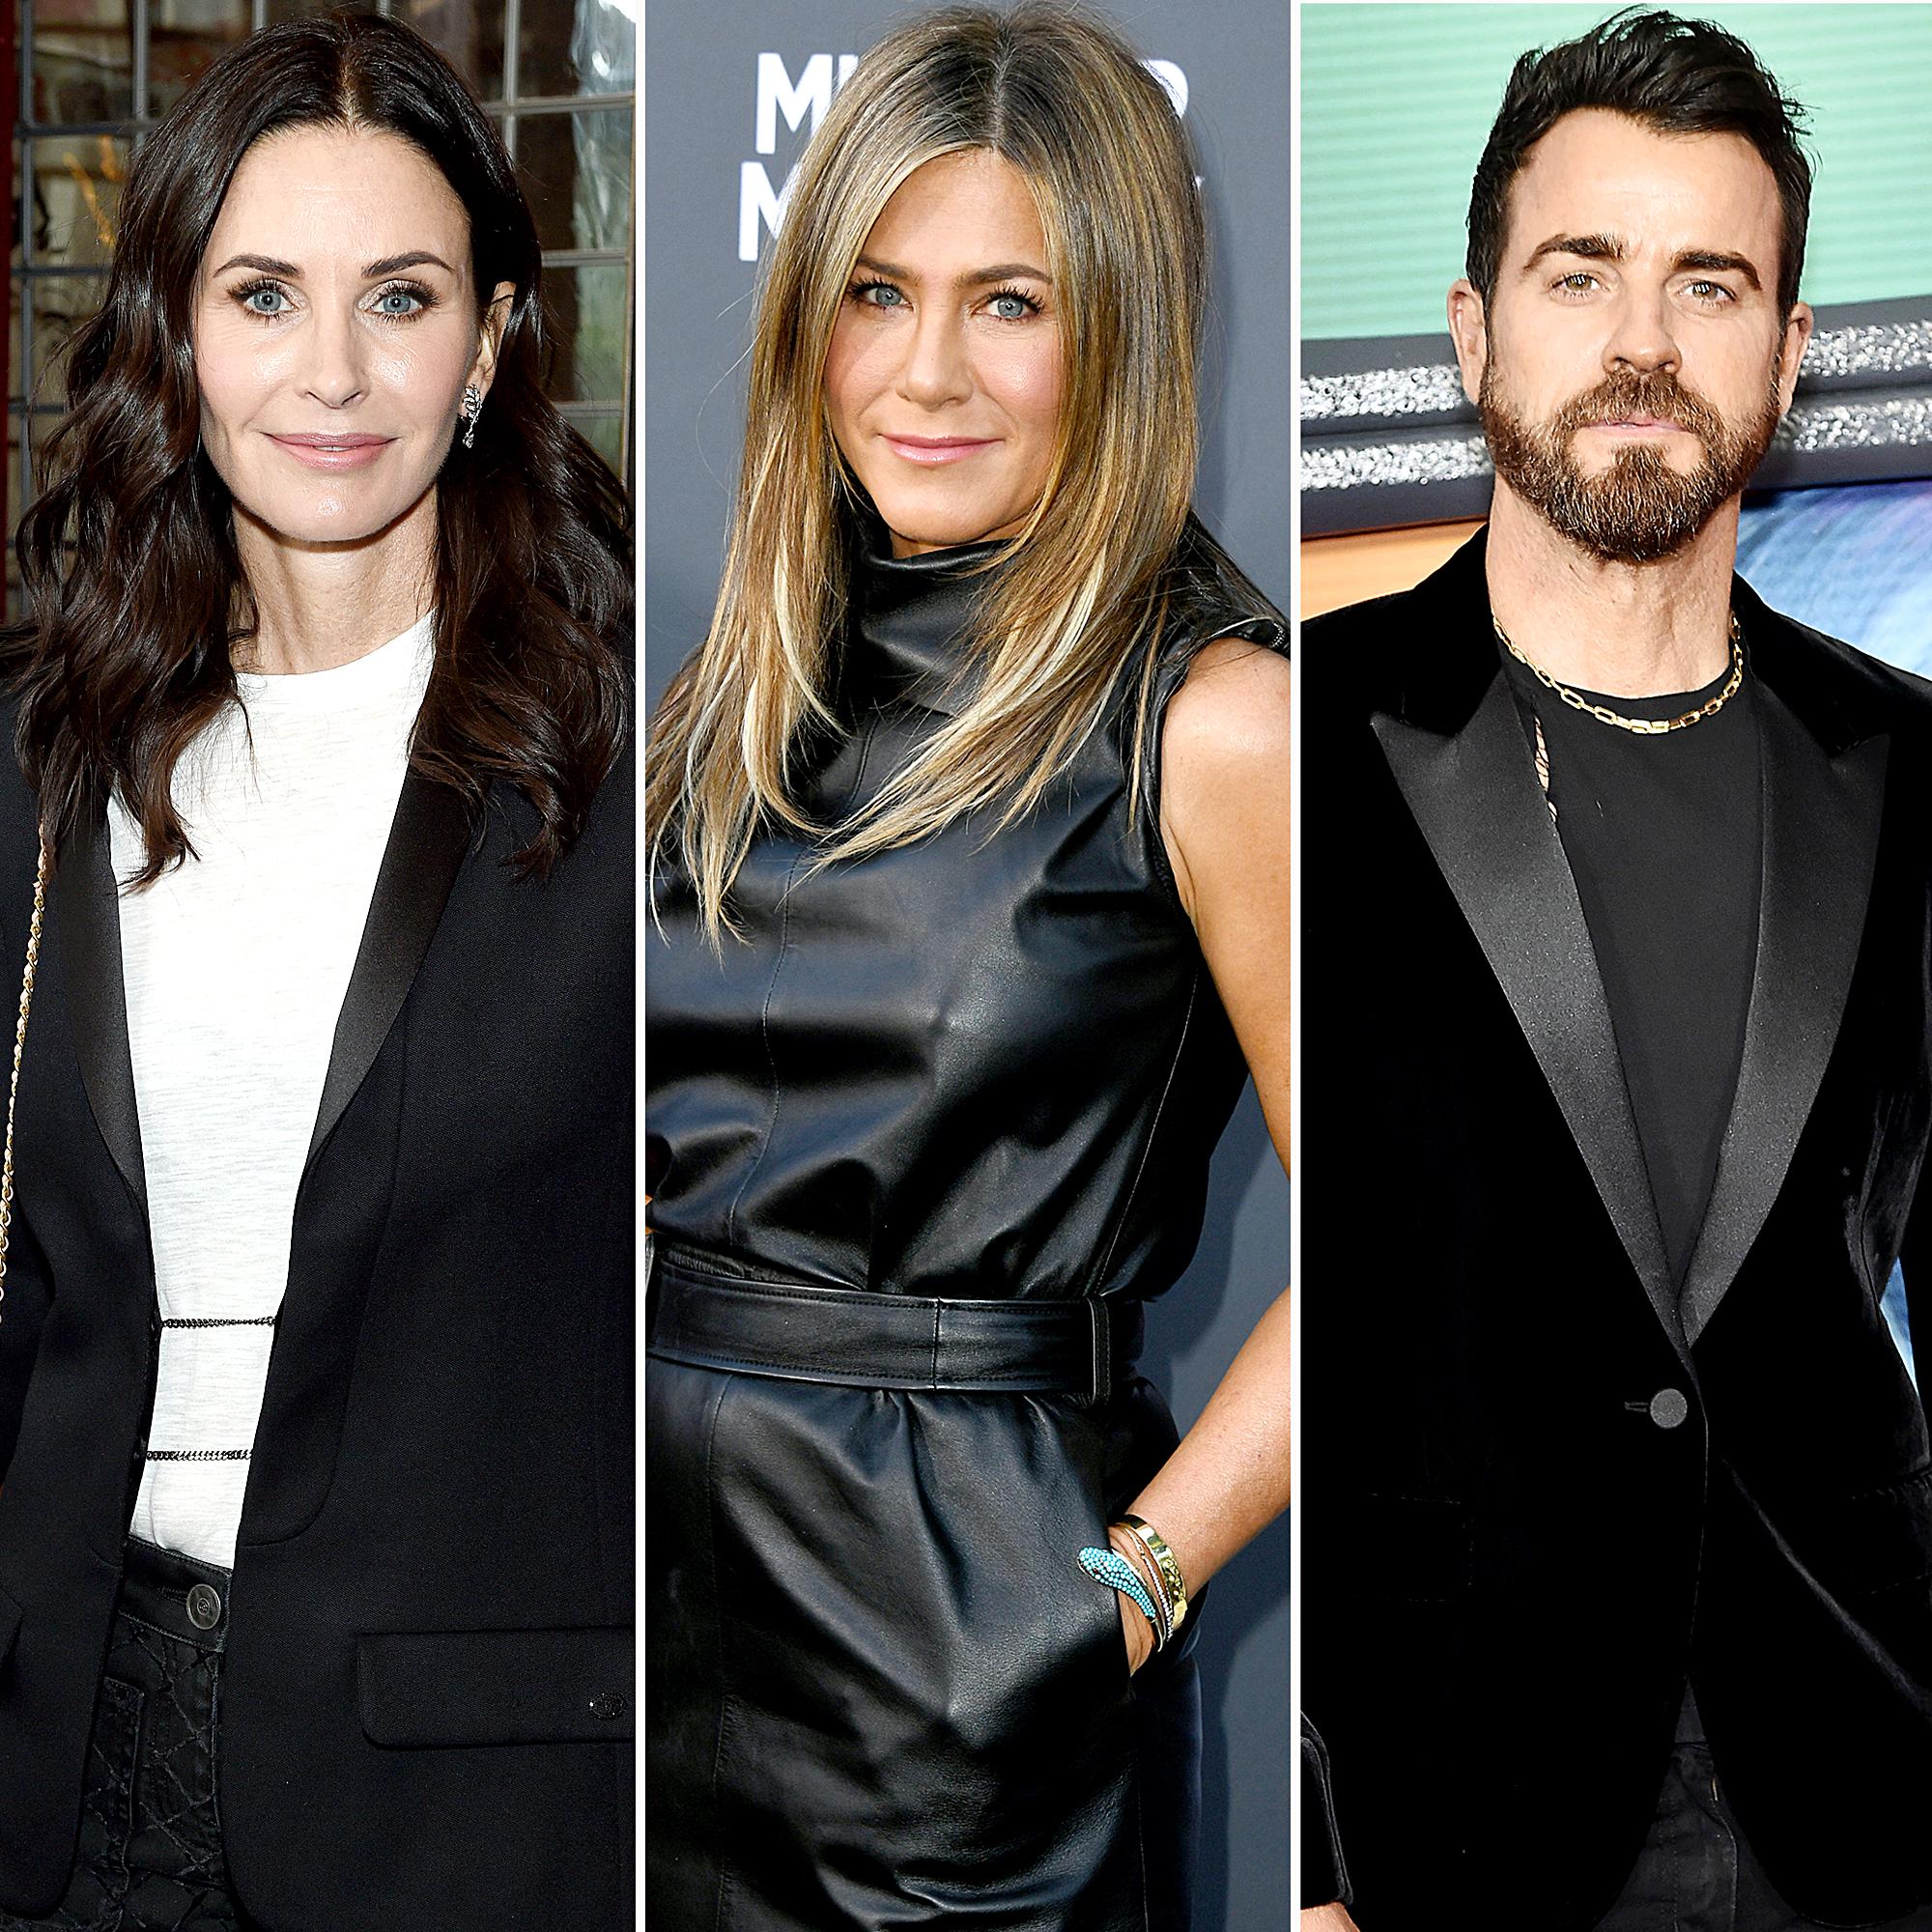 Courteney Cox Posts Sweet Message After Jennifer Aniston's